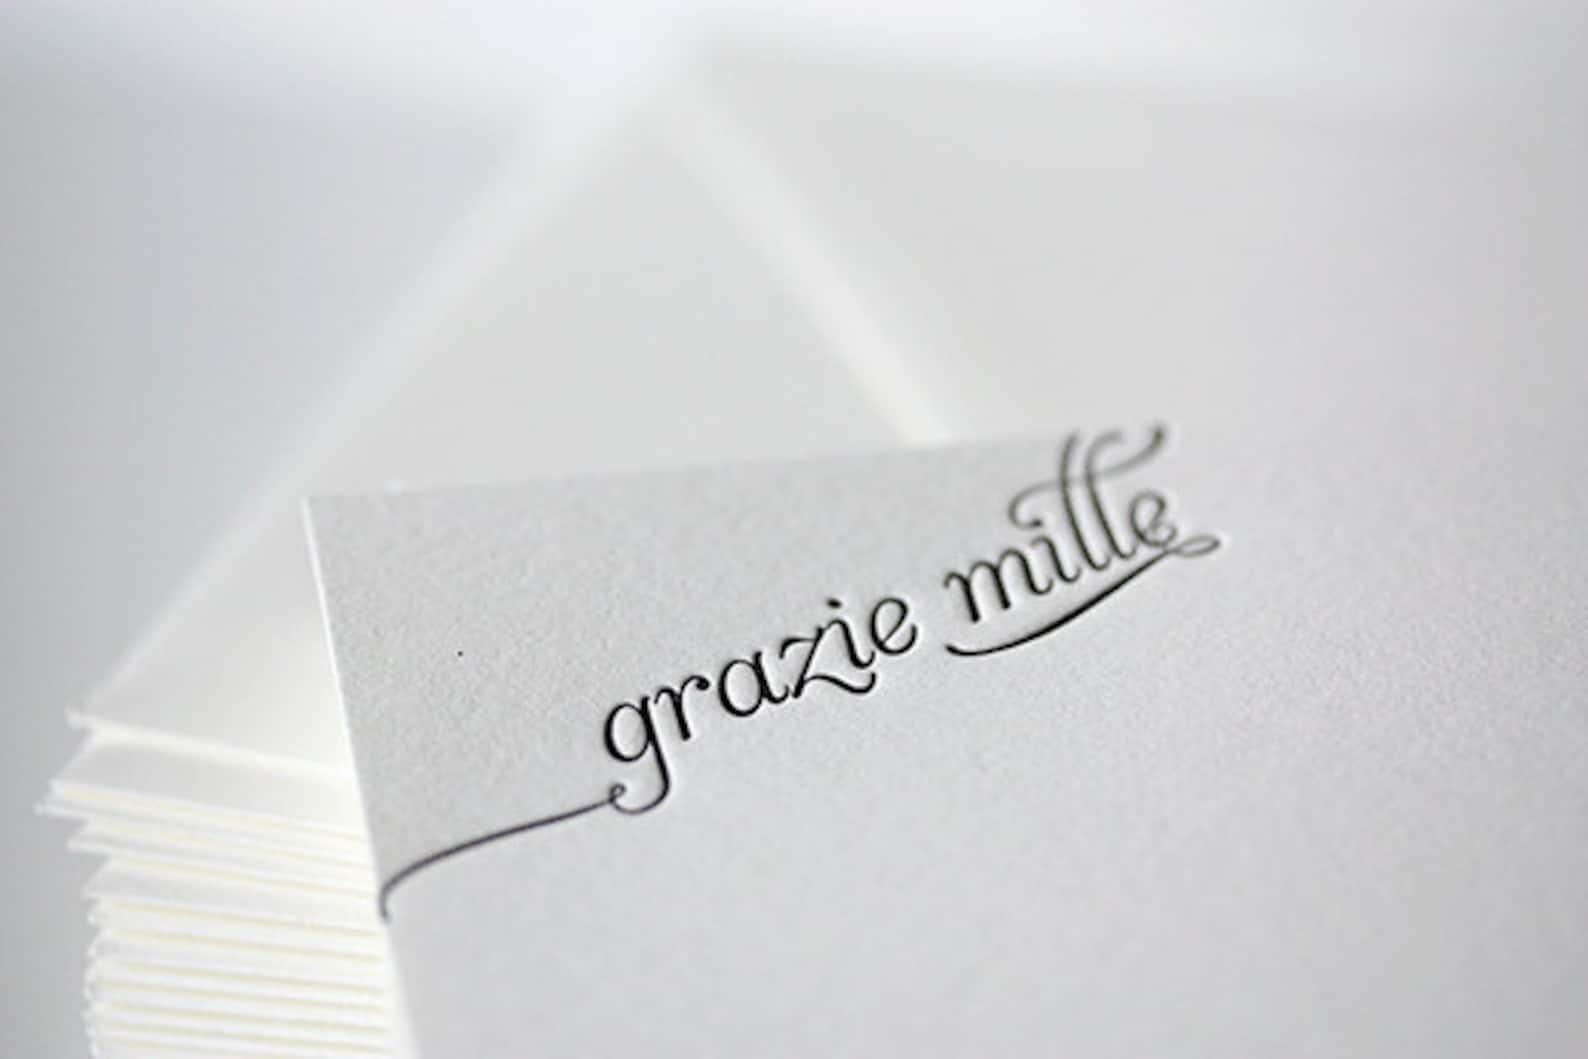 Юбилеем, спасибо по итальянски открытка